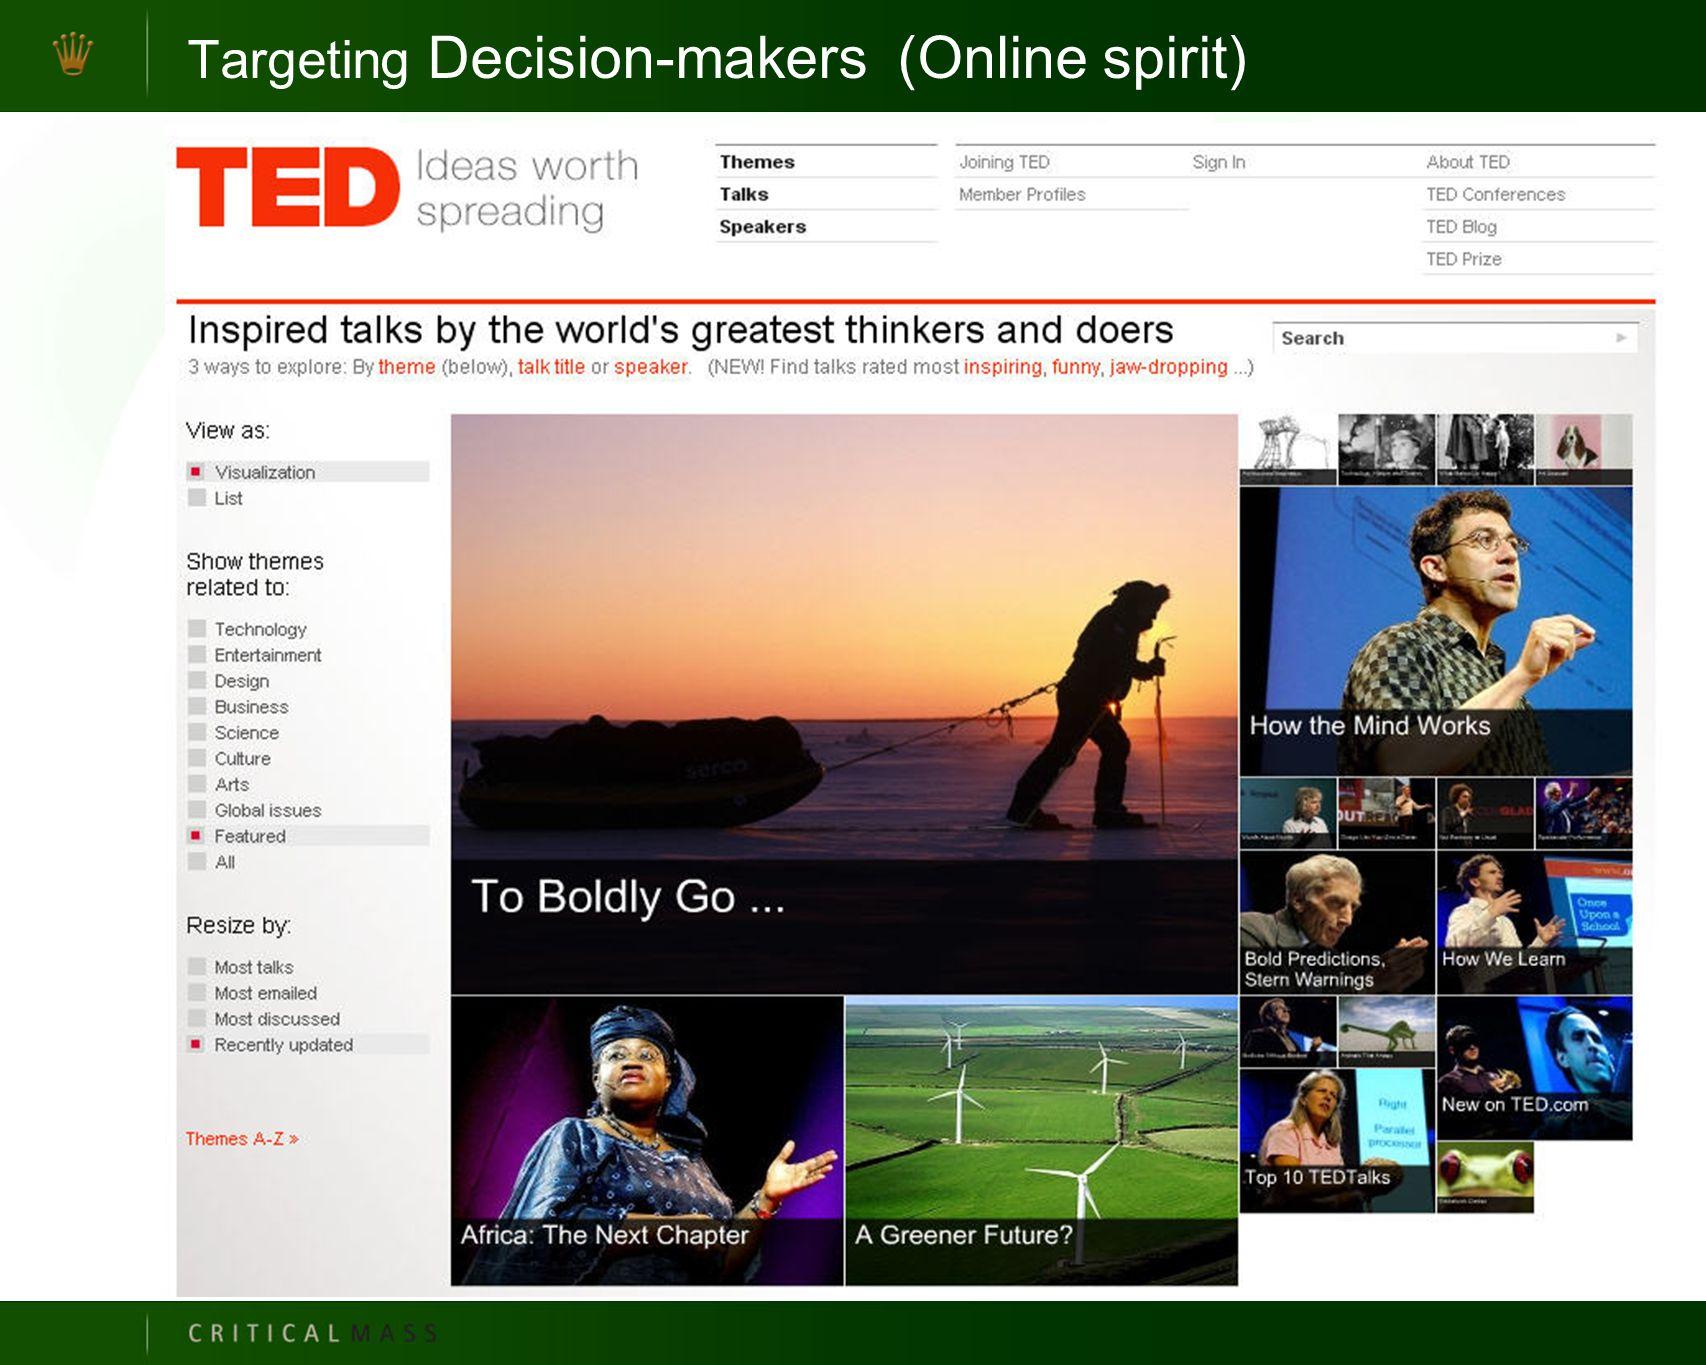 Targeting Decision-makers (Online spirit)